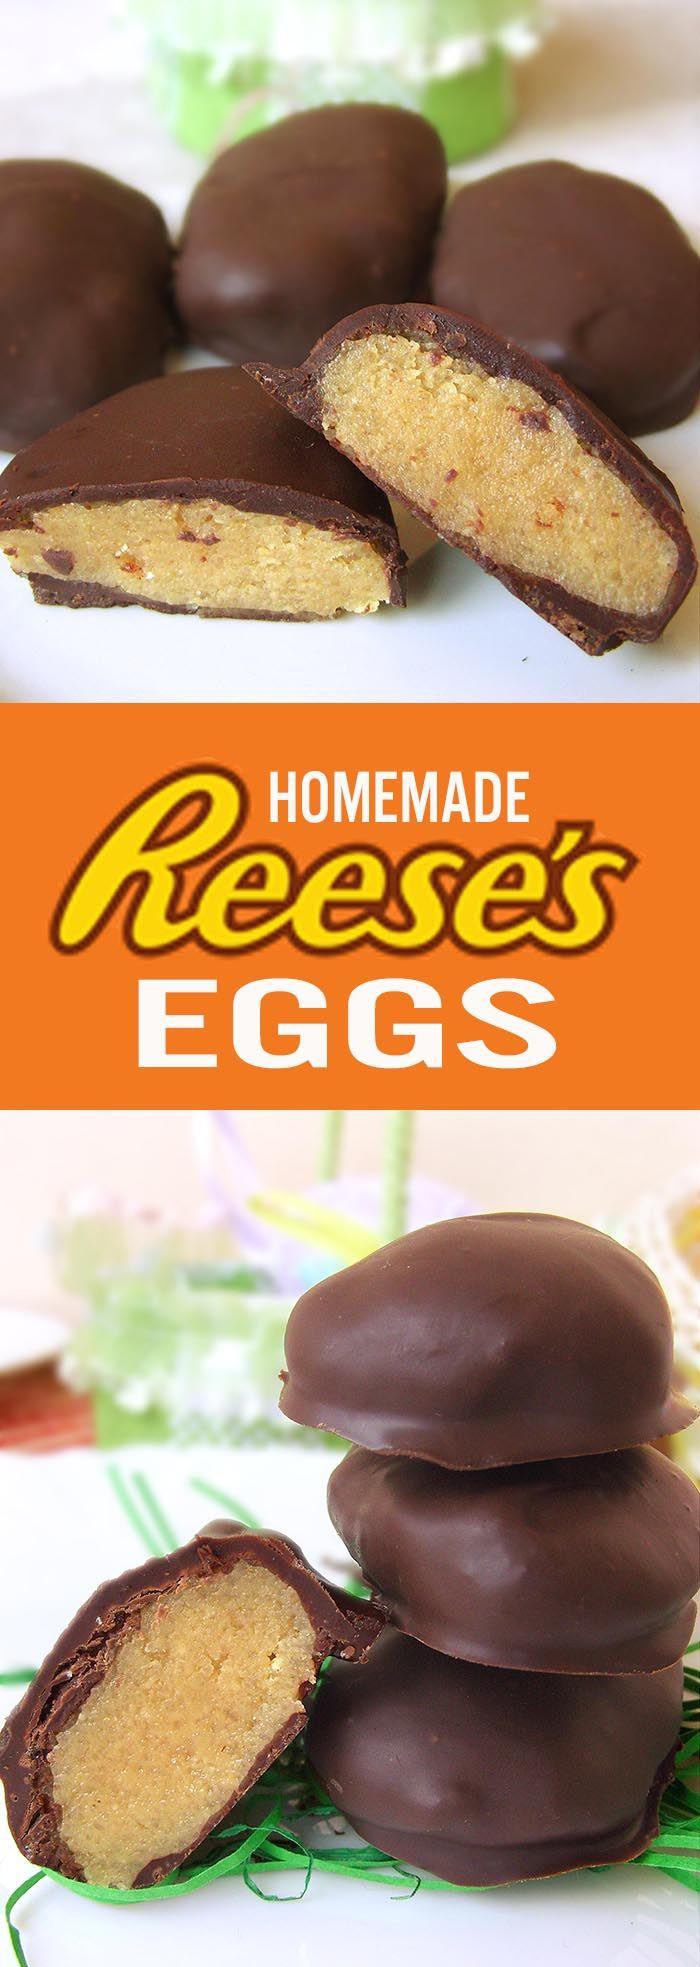 5-ingredient Peanut Butter stuffed Reese's eggs Copycat recipe